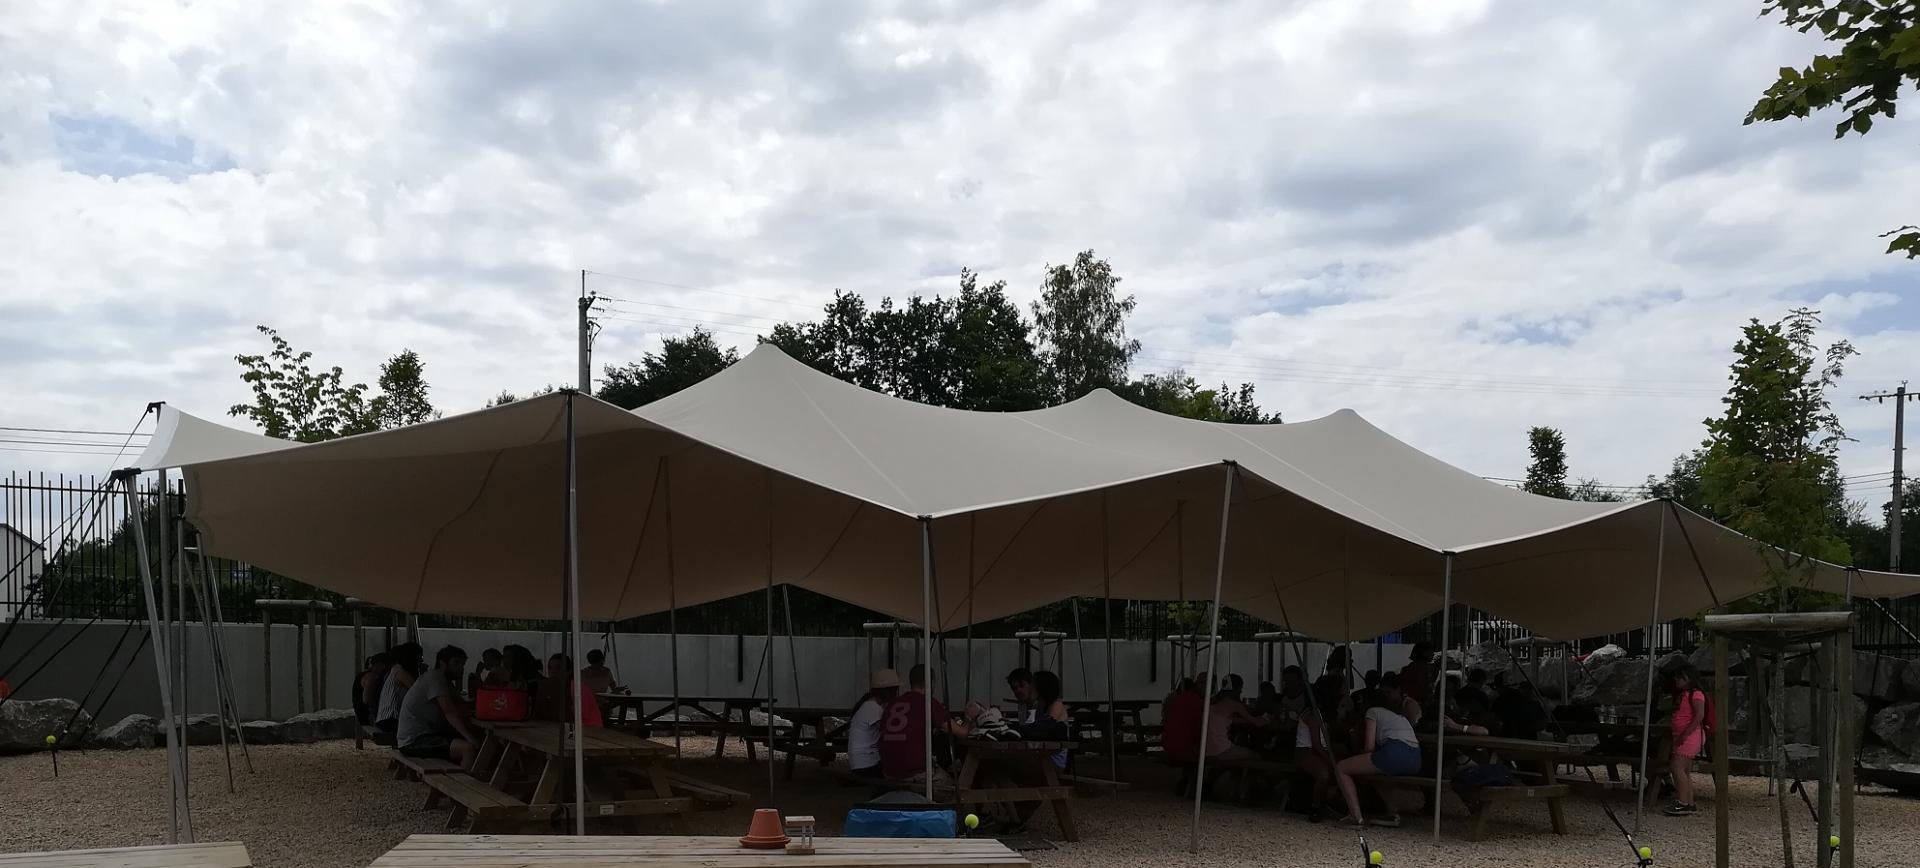 Tente berbere 10x15